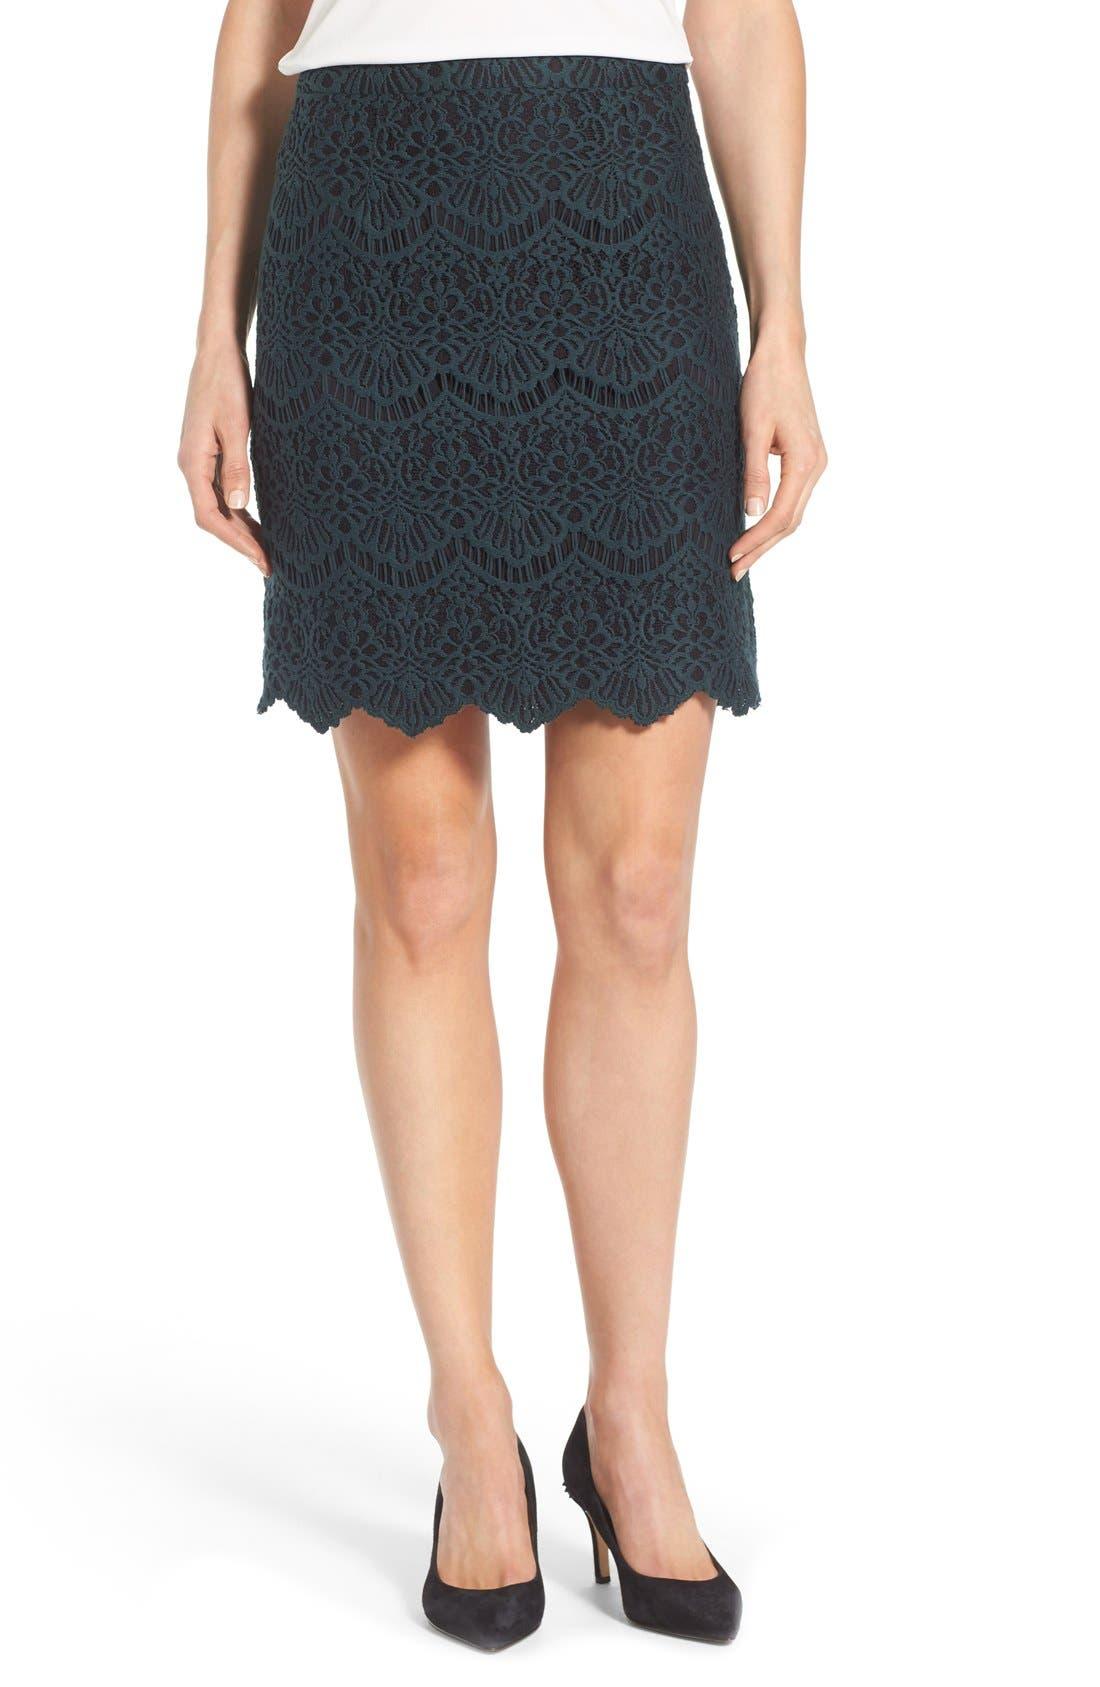 Alternate Image 1 Selected - Halogen® Scallop Edge Lace Skirt (Regular & Petite)